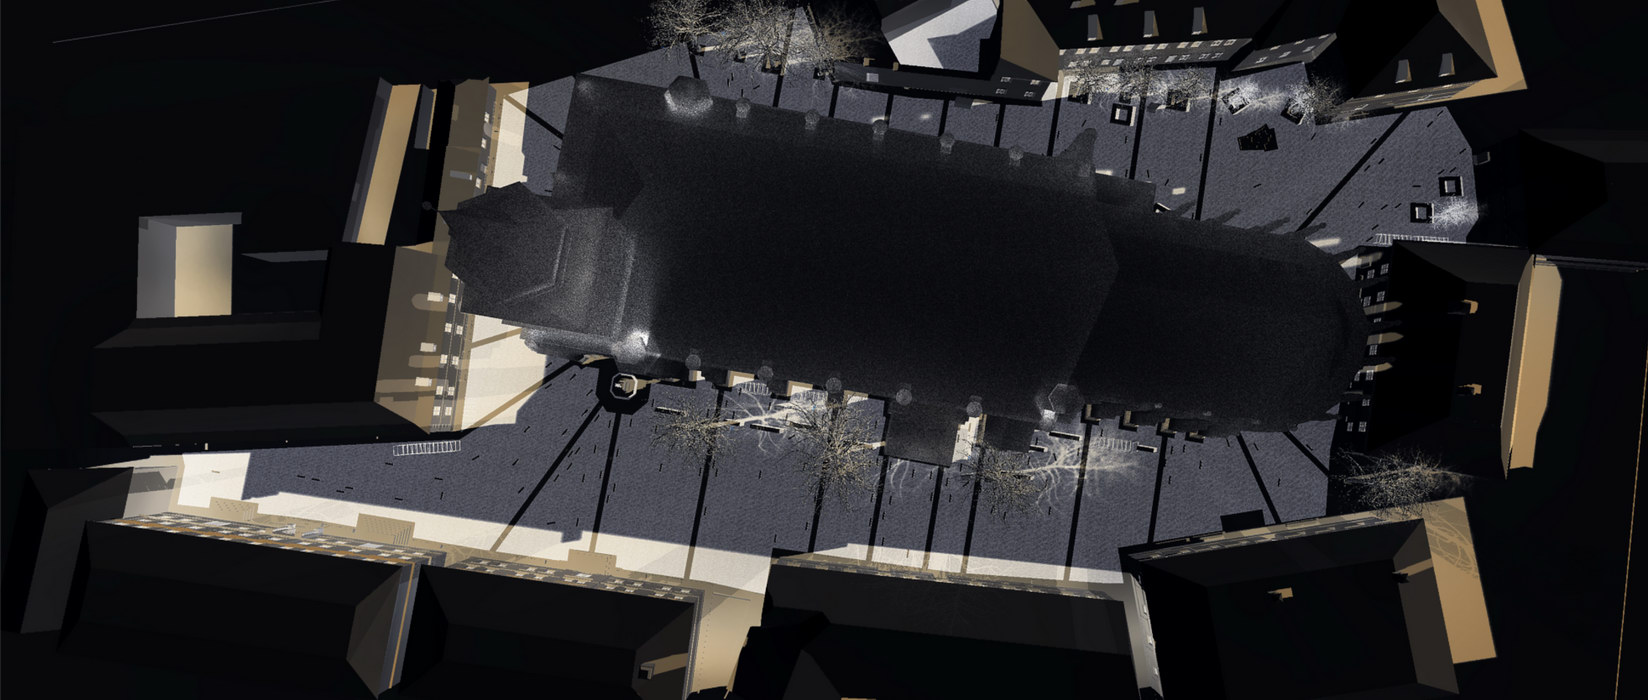 intro-crisan architecture-019_resize